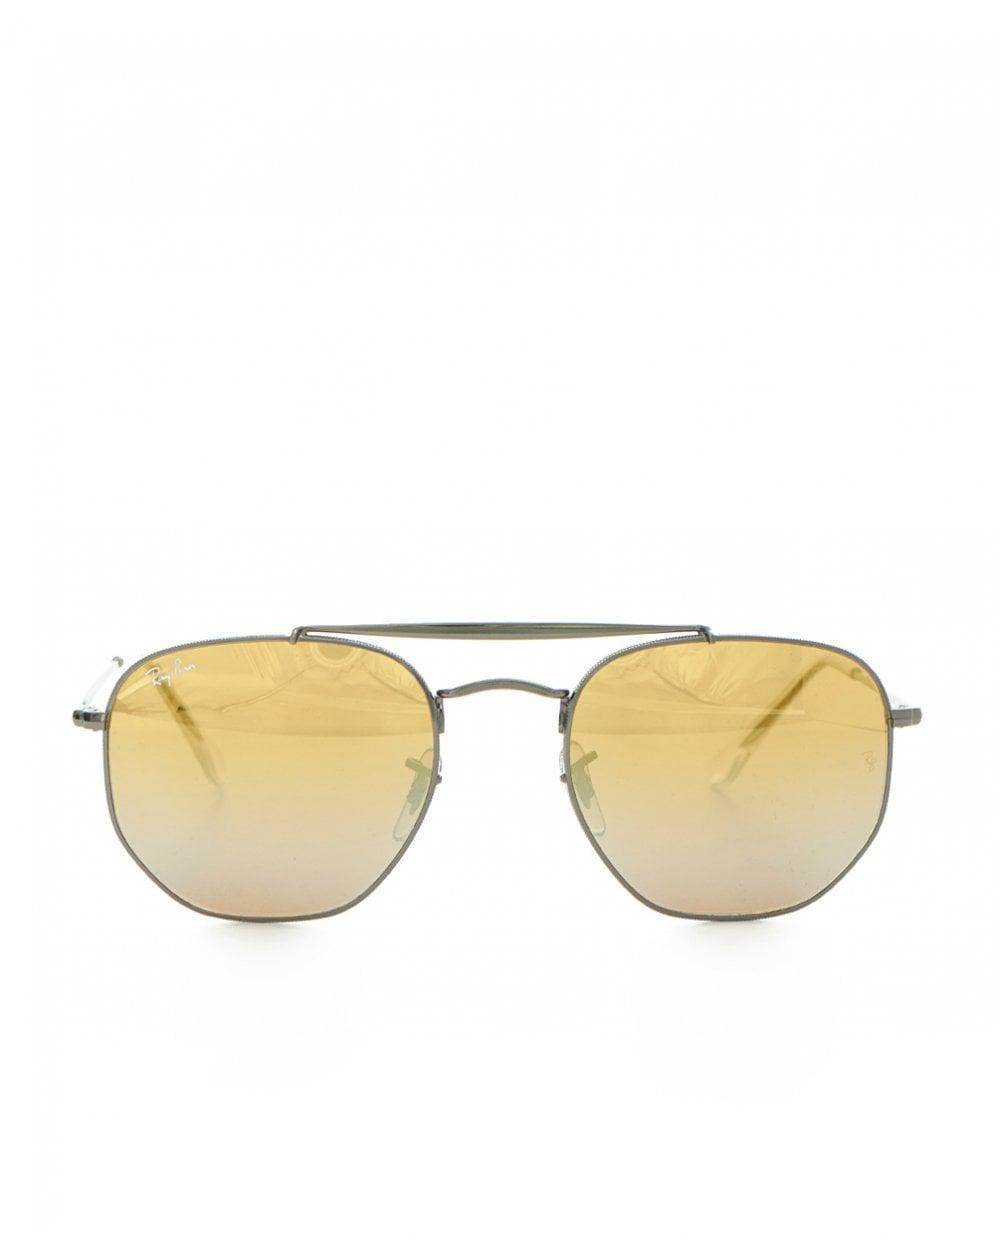 0fe3faec2a Ray-Ban Marshall Double Bridge Sunglasses for Men - Lyst